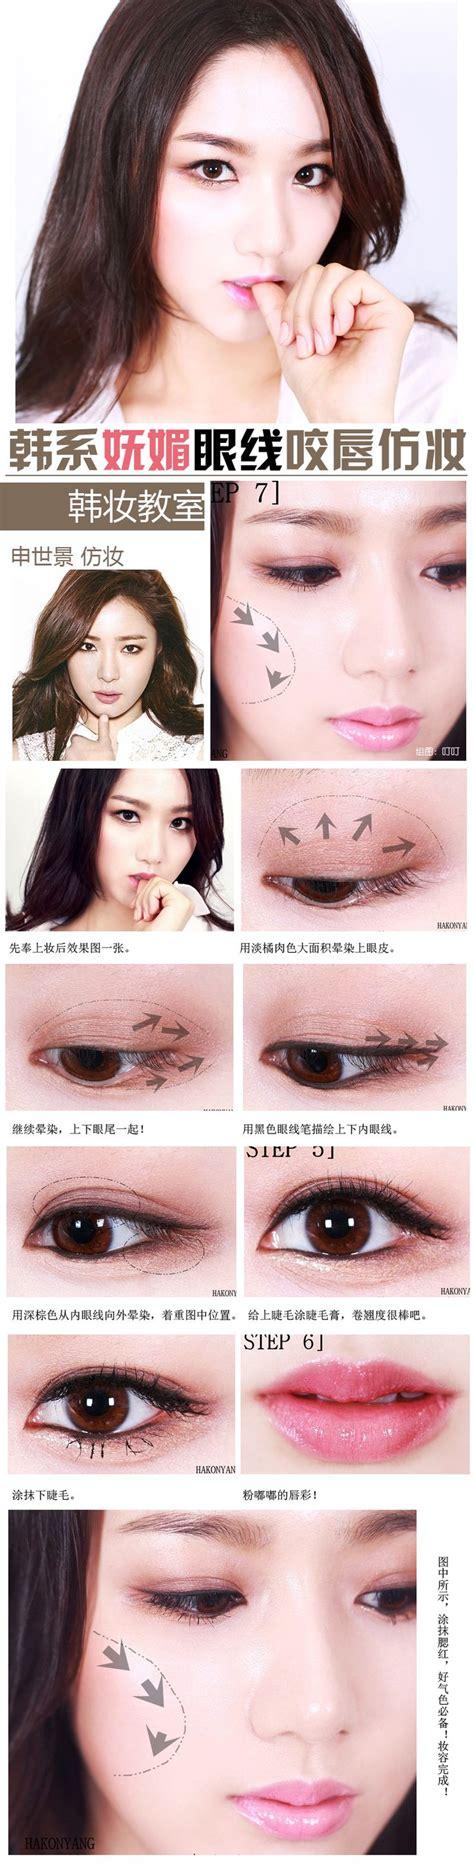 tutorial makeup korea 2014 asian makeup tutorial www skincareinkorea info i